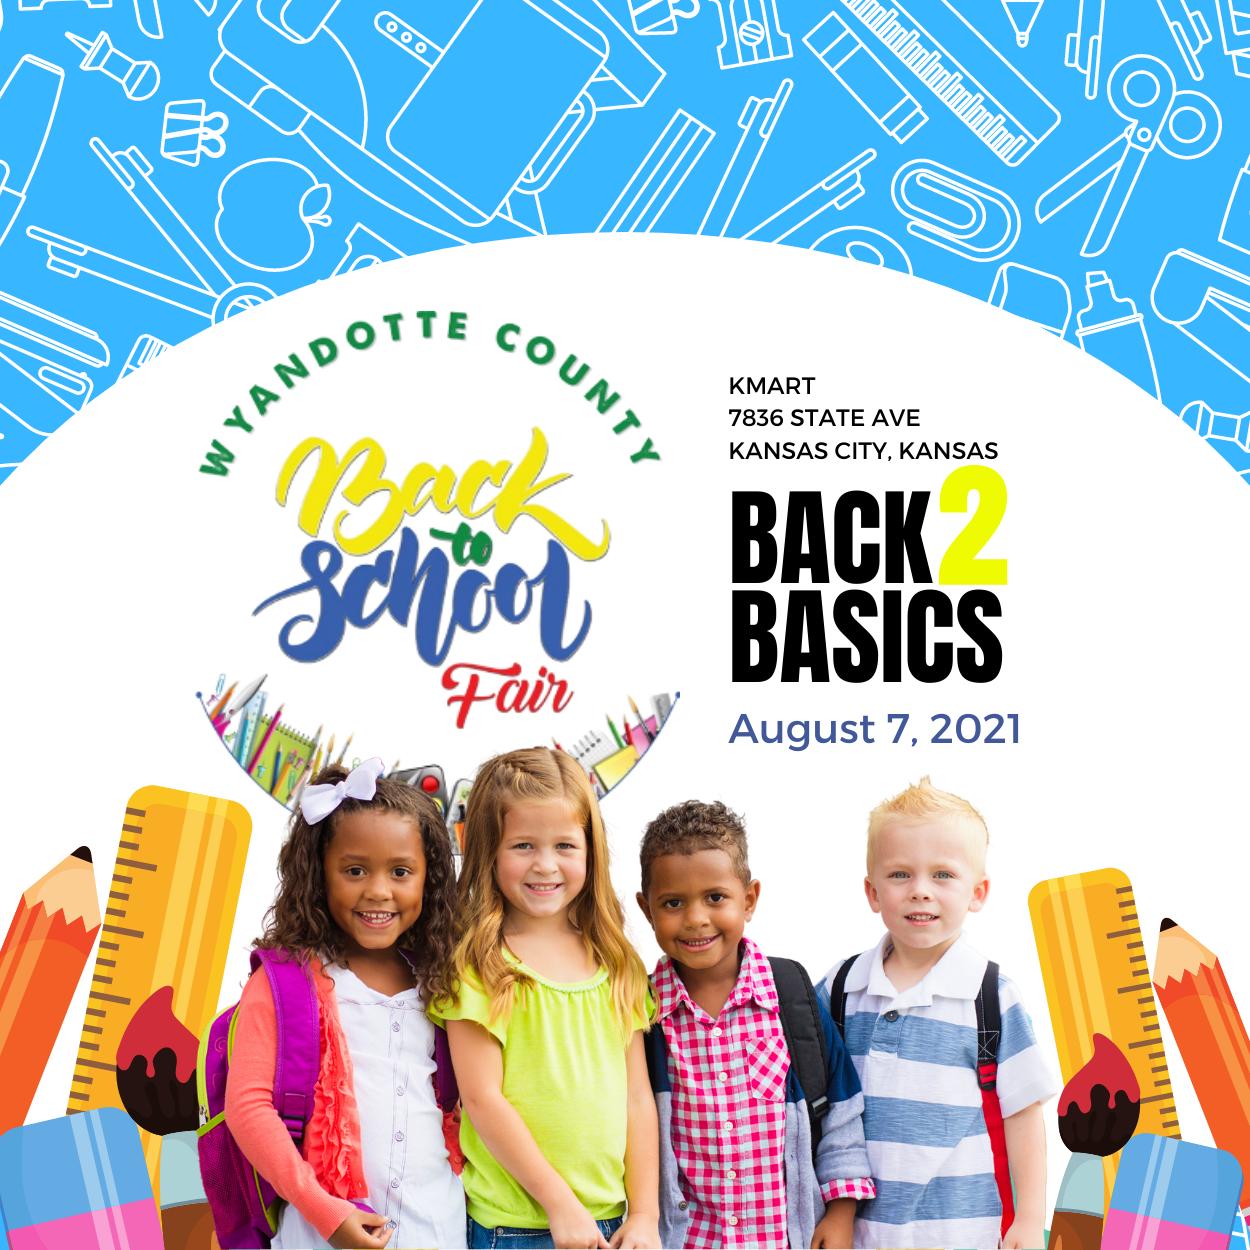 2021 Wyandotte County Back To School Fair